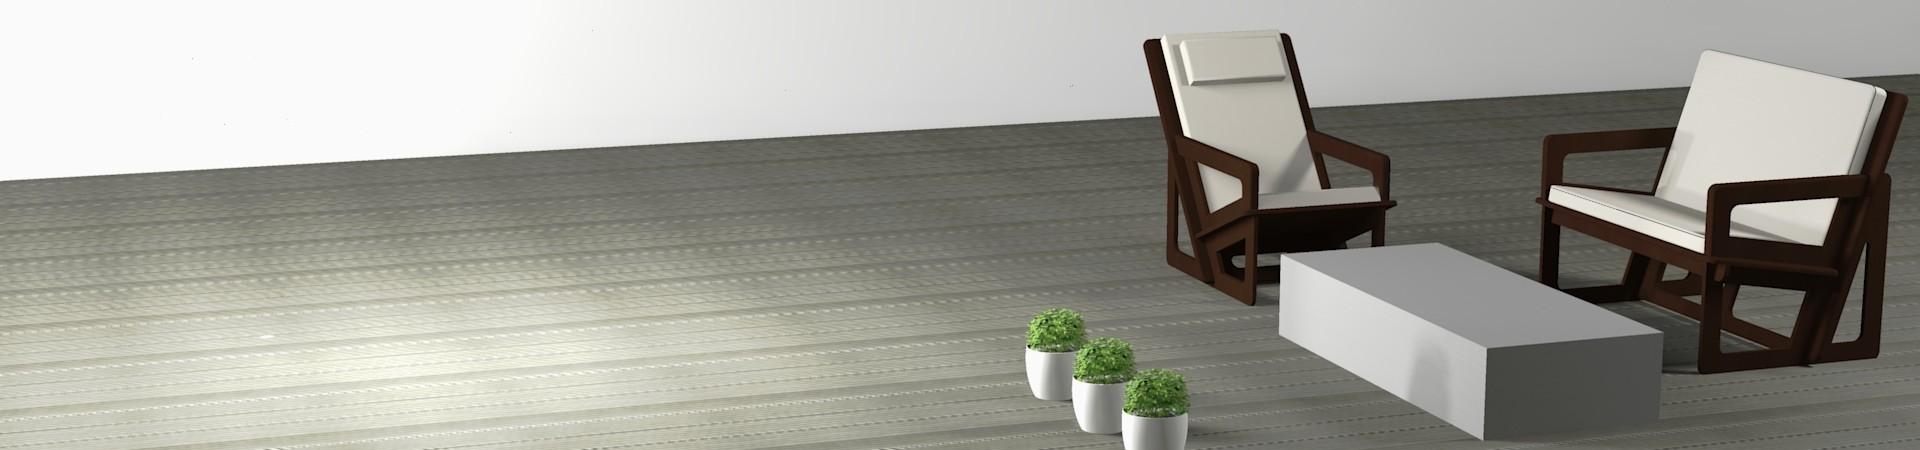 Made-to-measure garden furniture